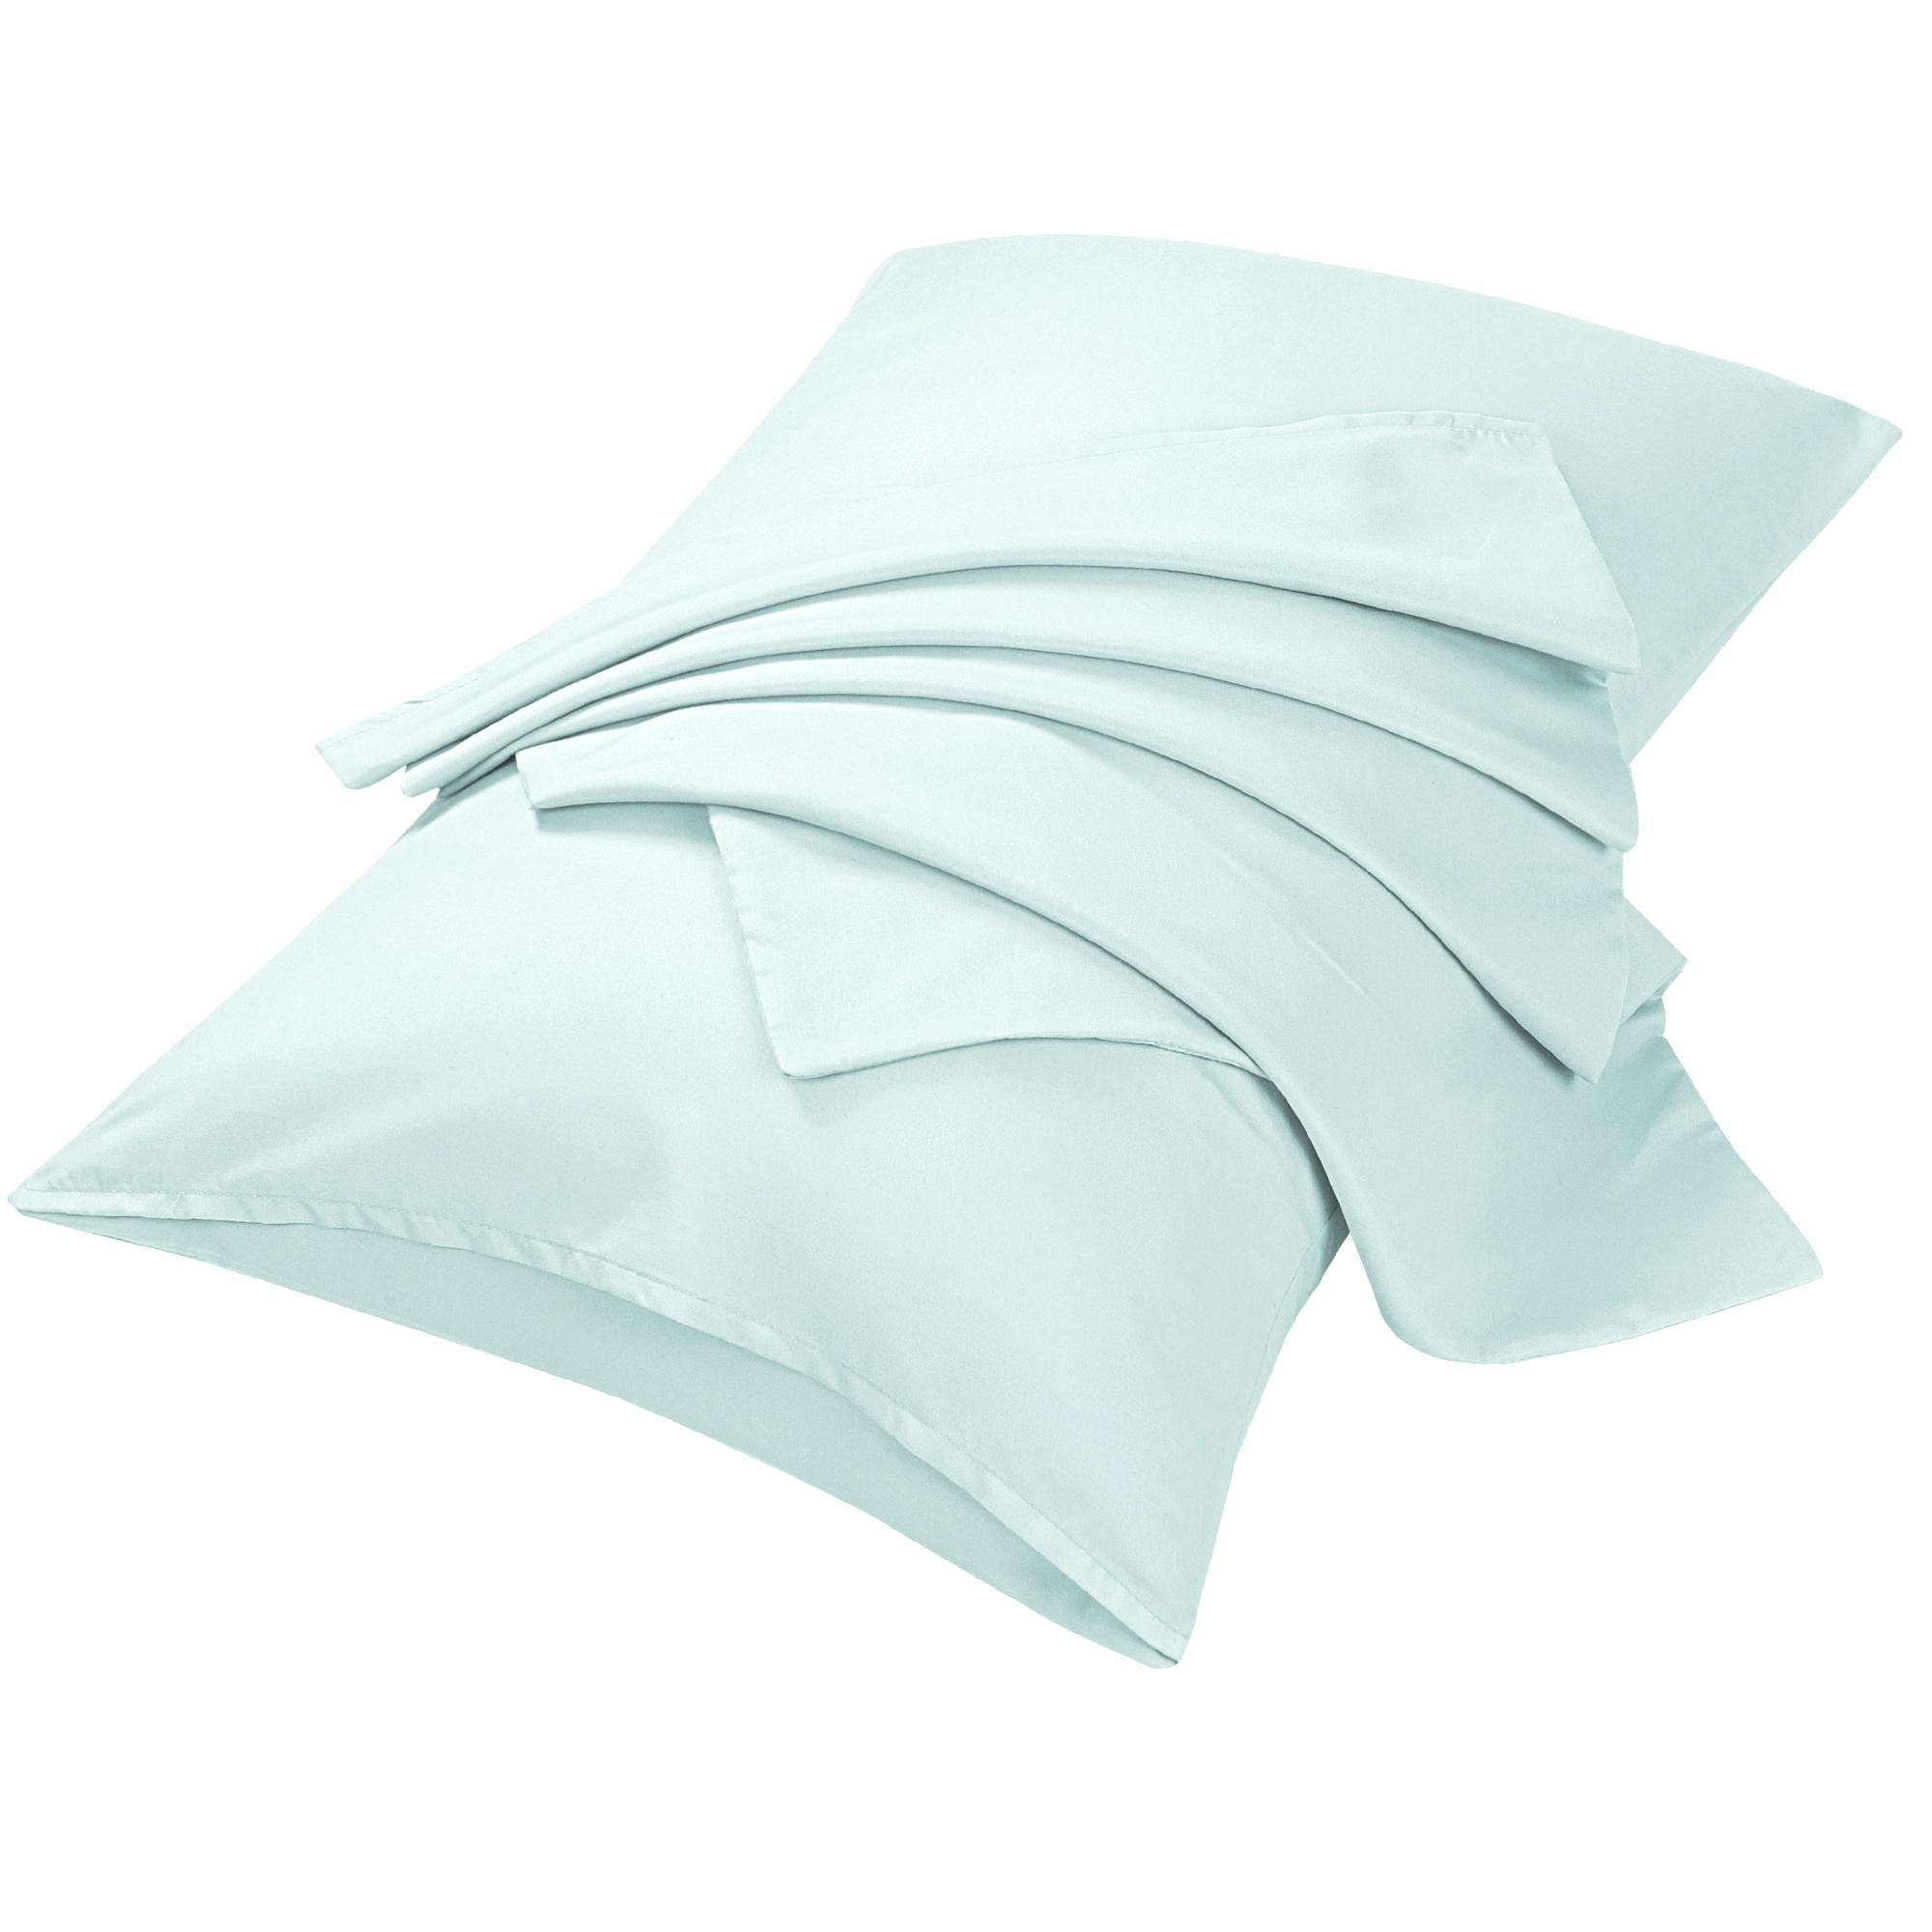 "2pcs Pillowcases Soft Microfiber, No Wrinkle, Light Gray Travel (14"" x 20"")"